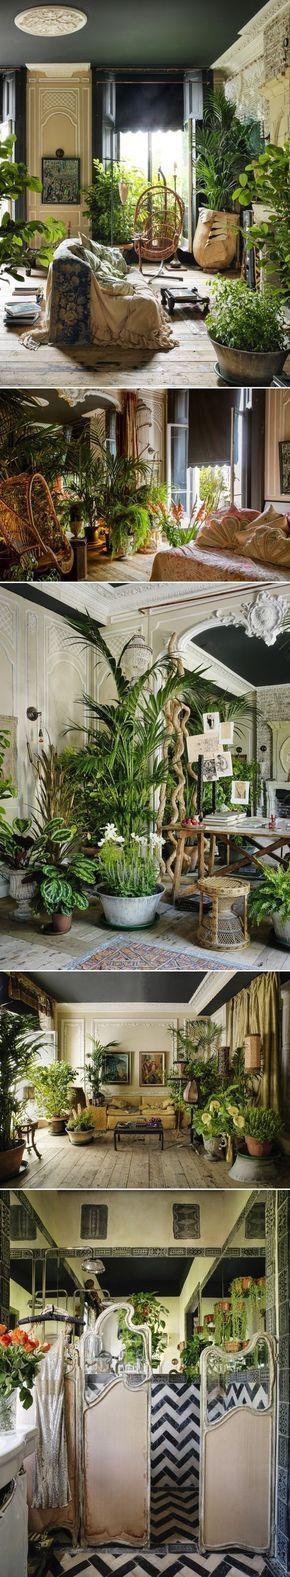 Best 25+ Home decor uk ideas on Pinterest Living room decor uk - kleine u küche